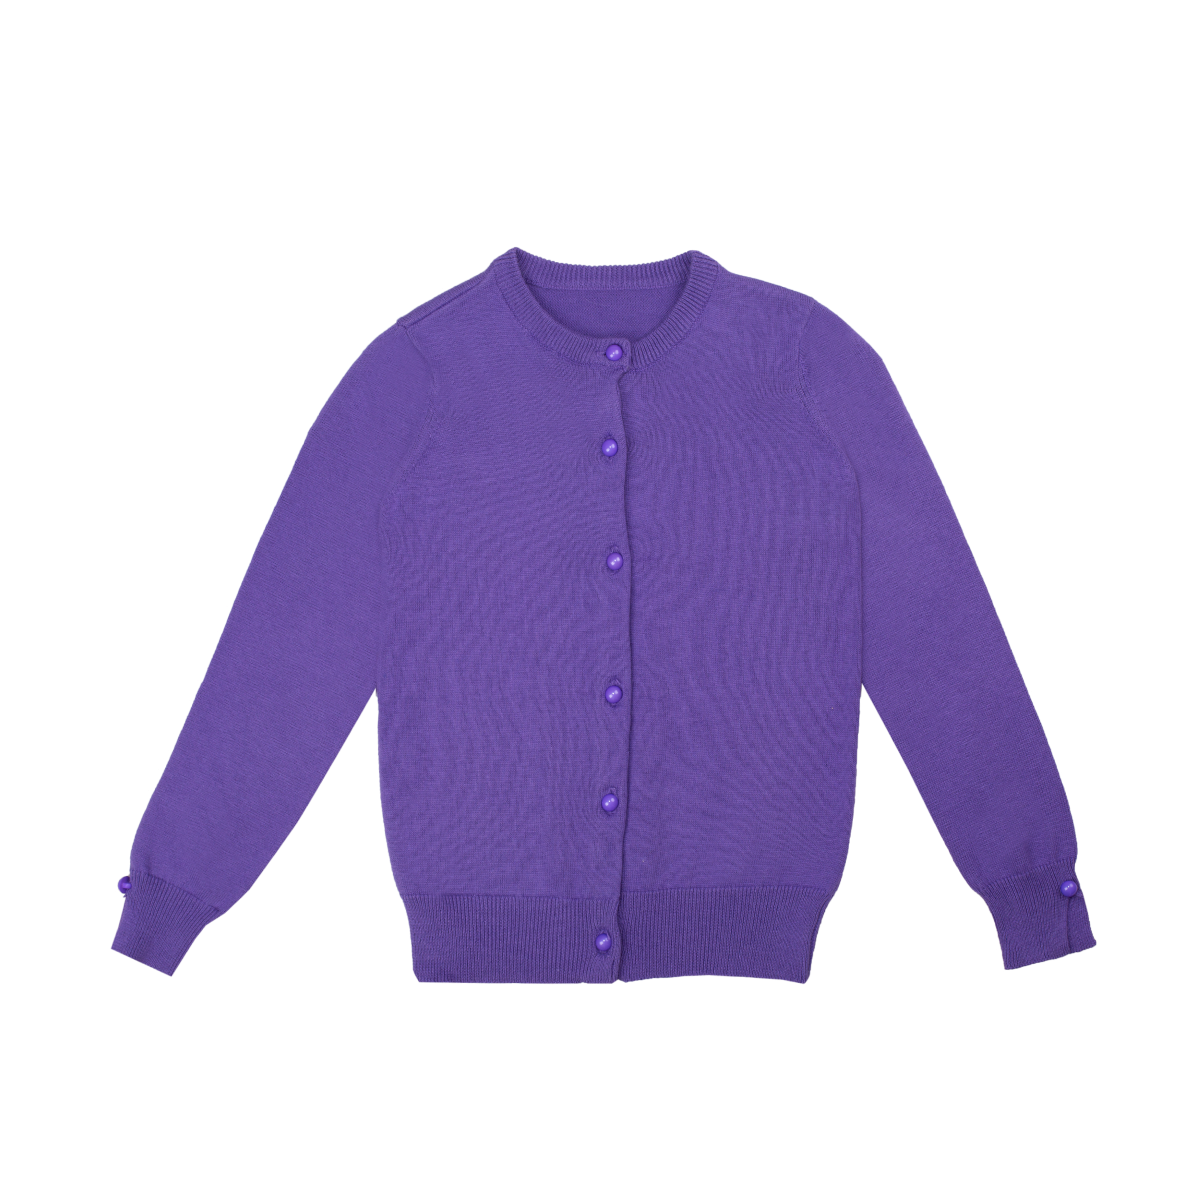 Dekliška jopica, vijolična